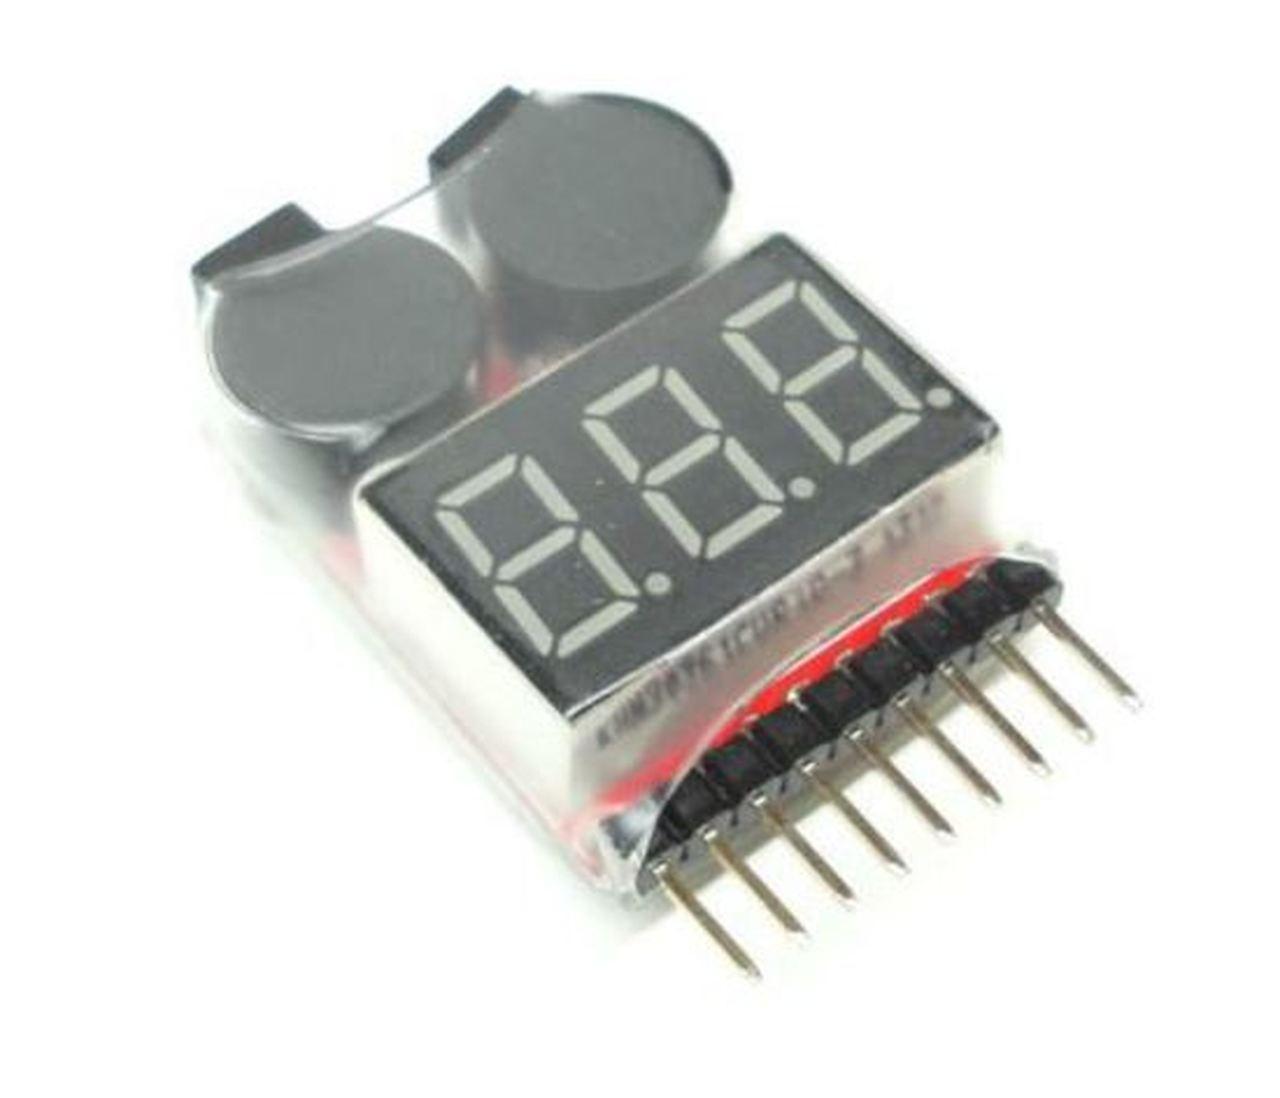 RC Pro #BM001 Lipo Battery Checker/Low Voltage Alarm